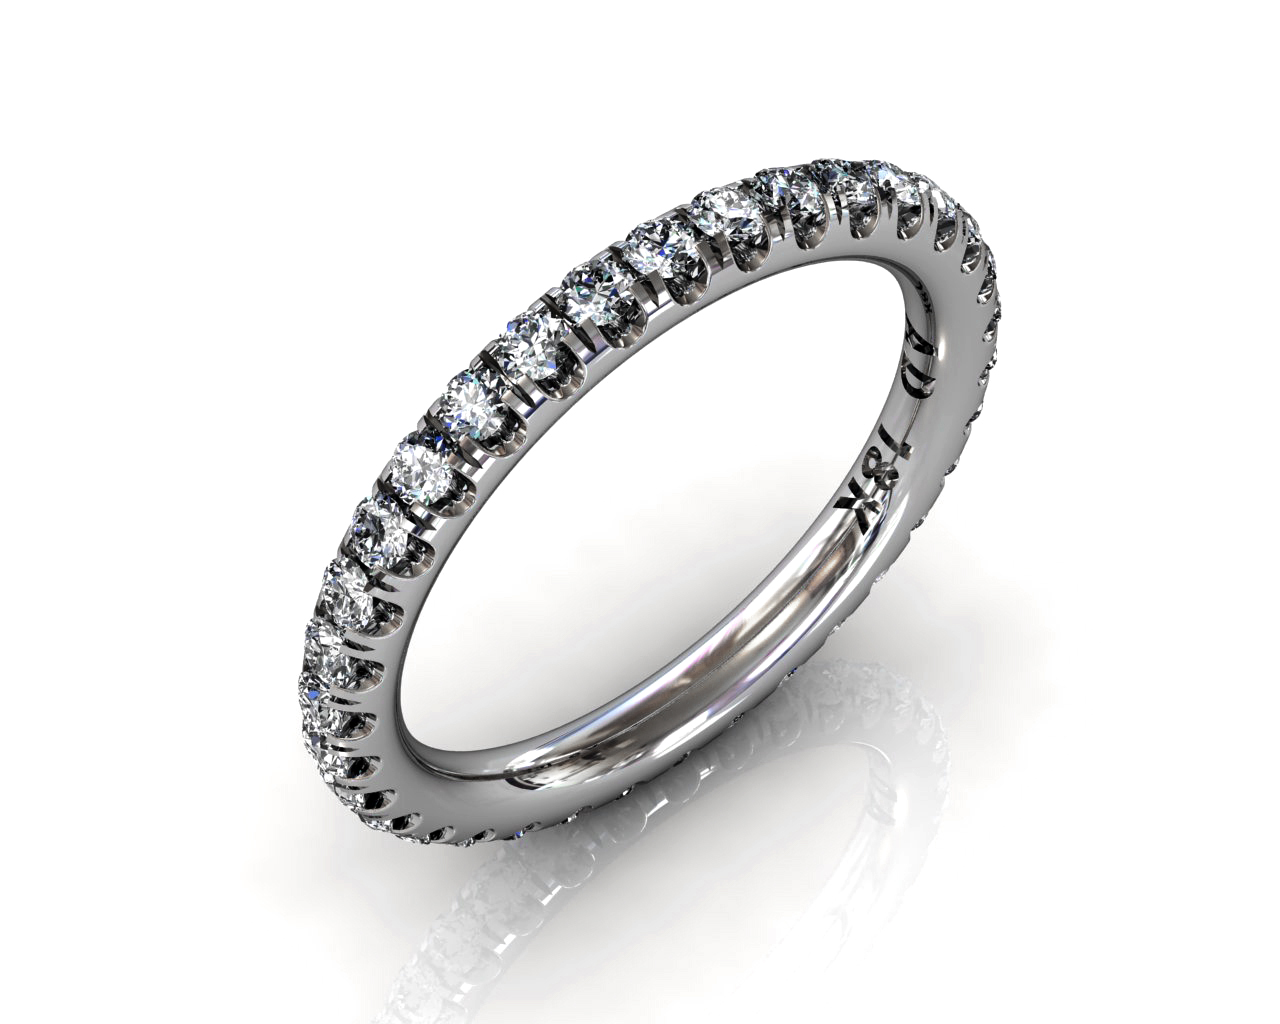 Wedding Bands Ladies Diamonds Craponia 24 Stone 0.74 TCW 3.0g 18kt White Gold